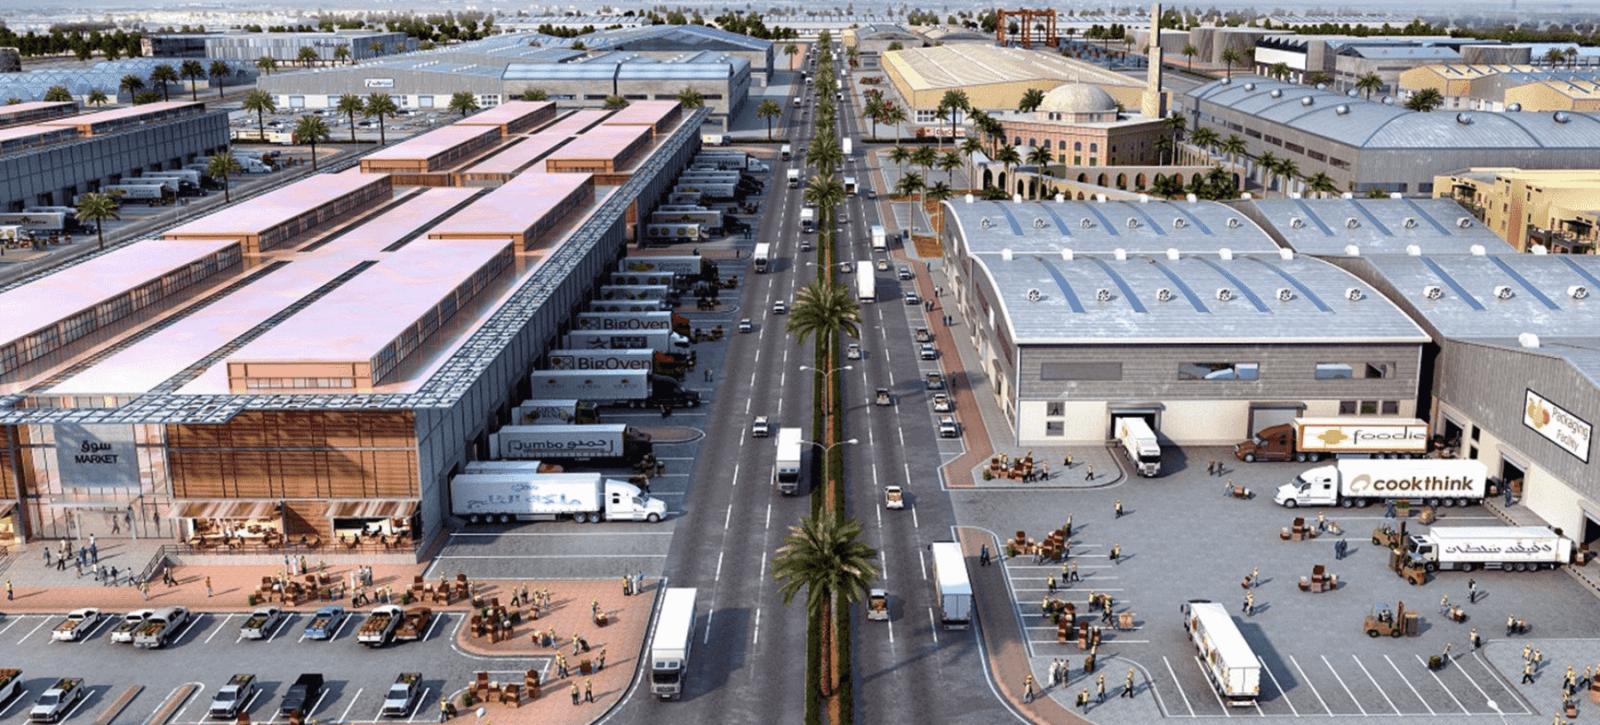 Dubai Wholesale City_Food Market_TECOM Group